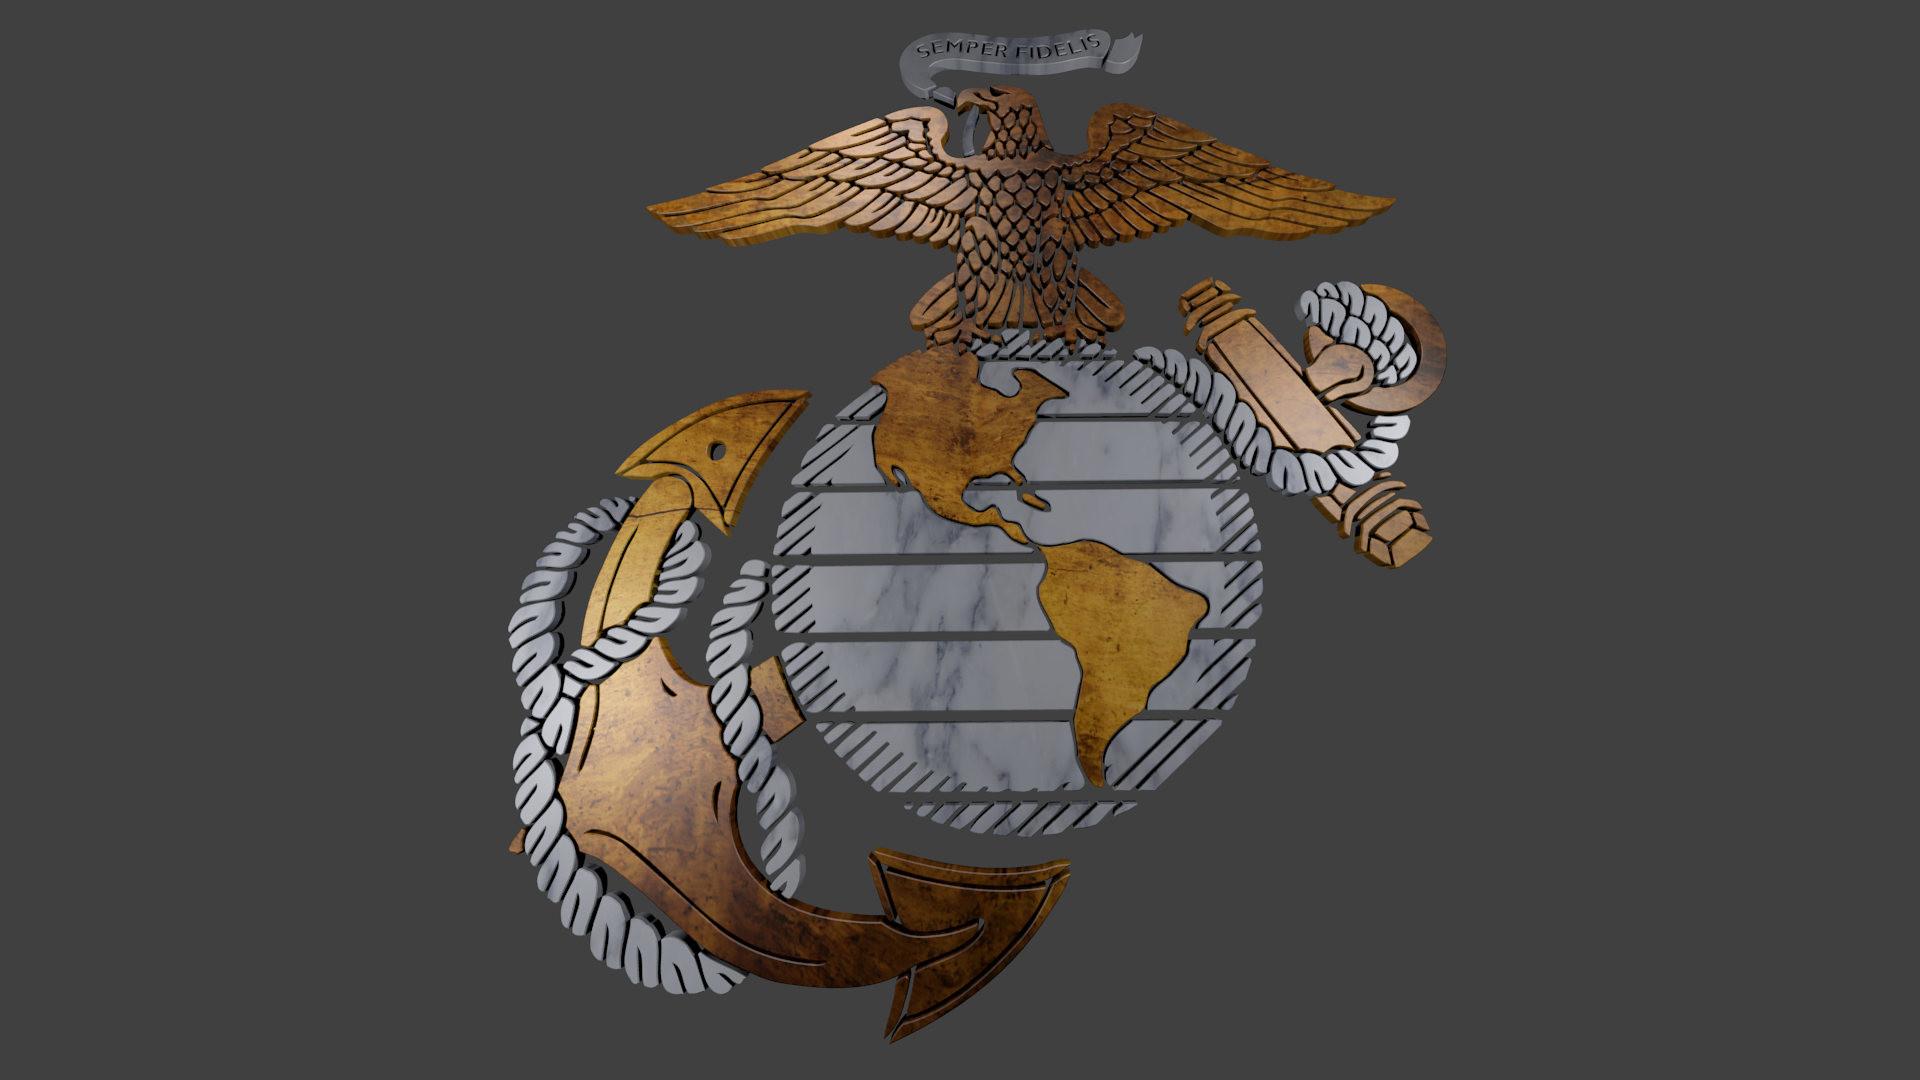 Marines USMC military wallpaper background